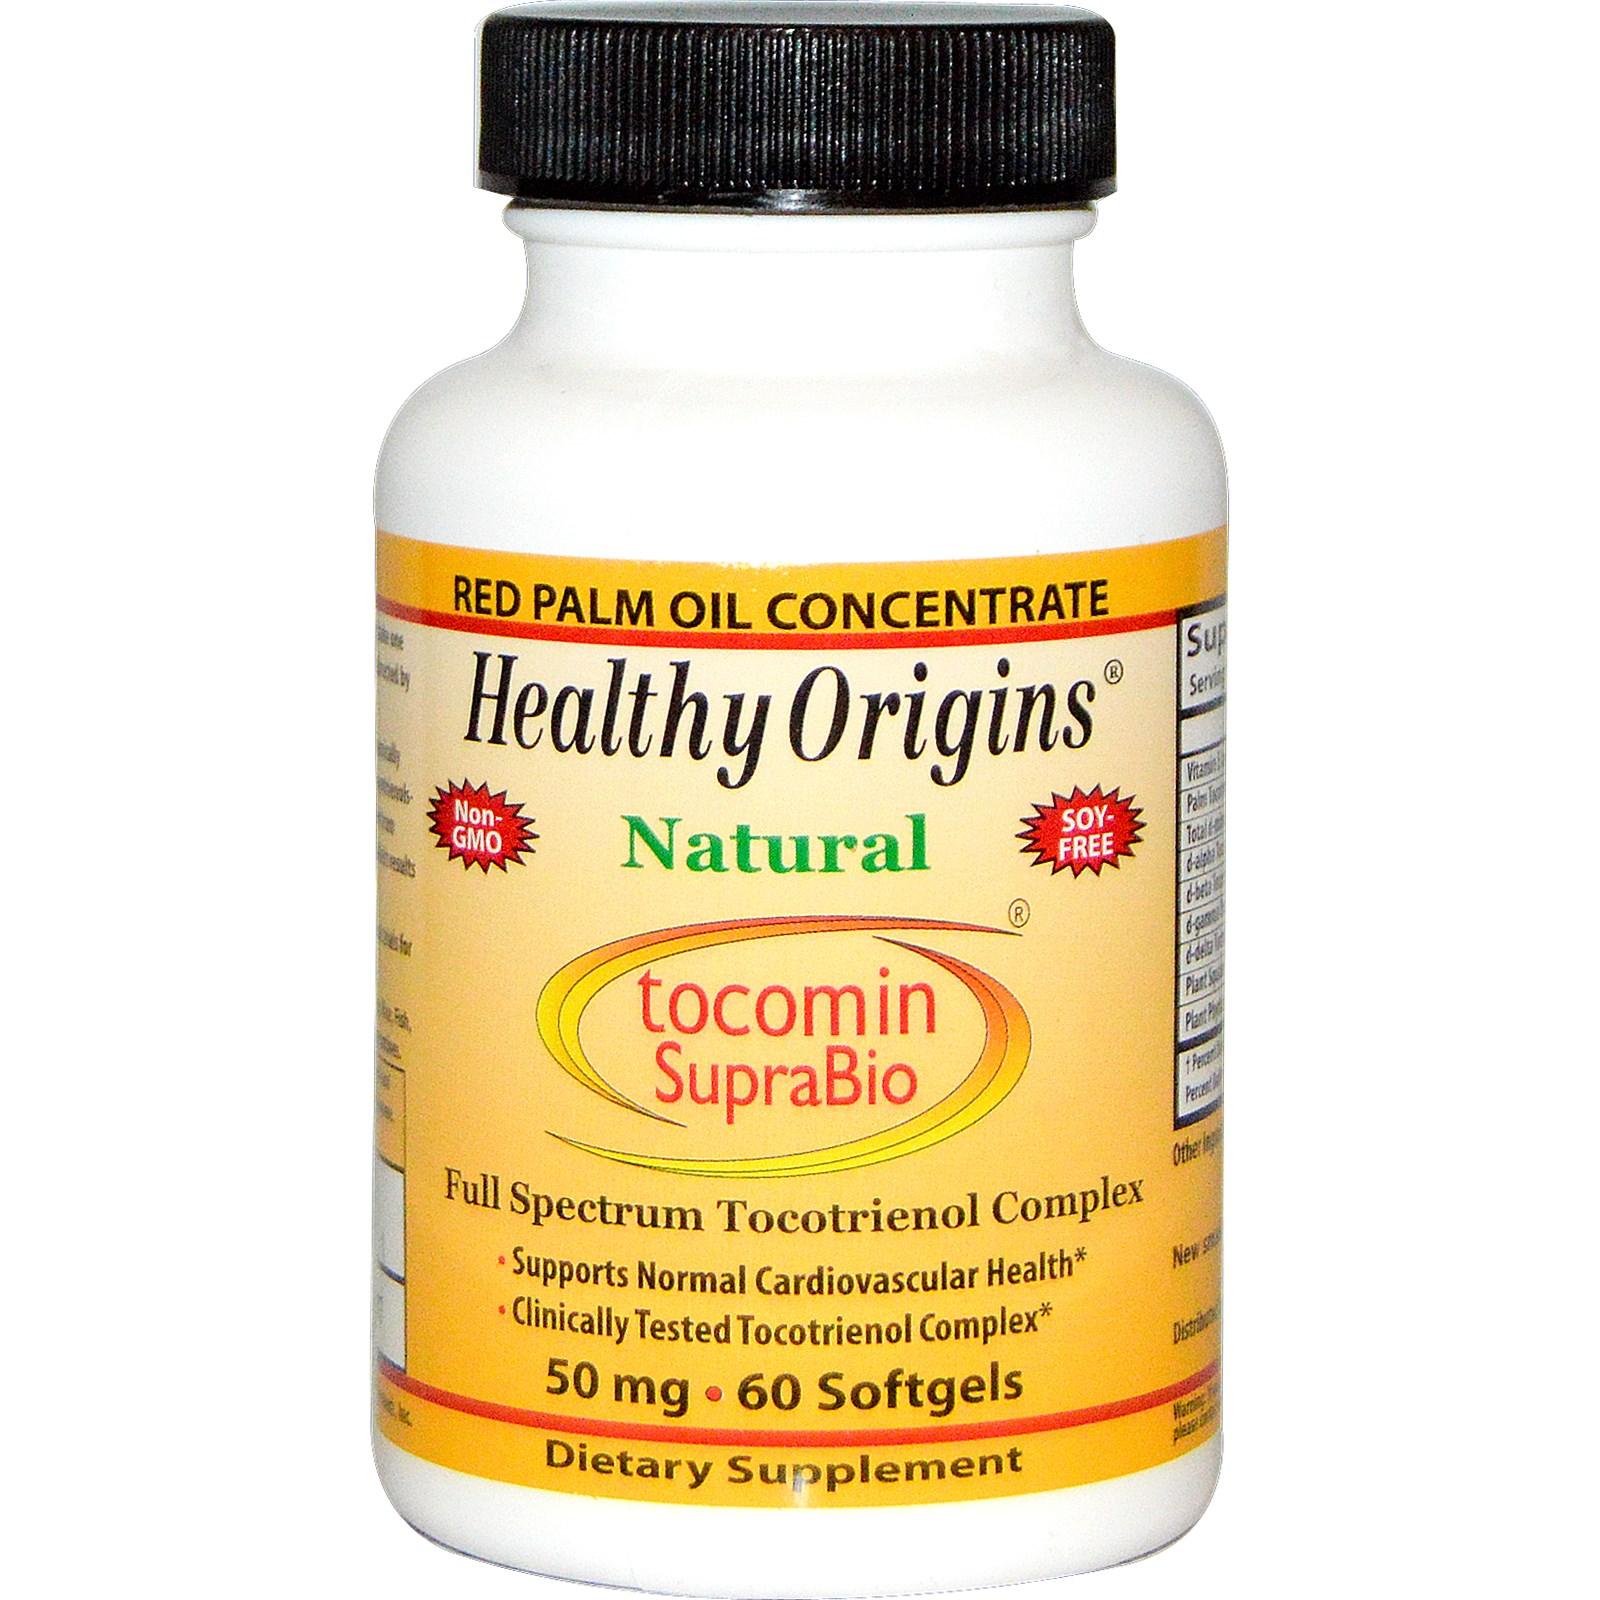 Image of Healthy Origins, Tocomin SupraBio, 50 mg, 60 Softgels